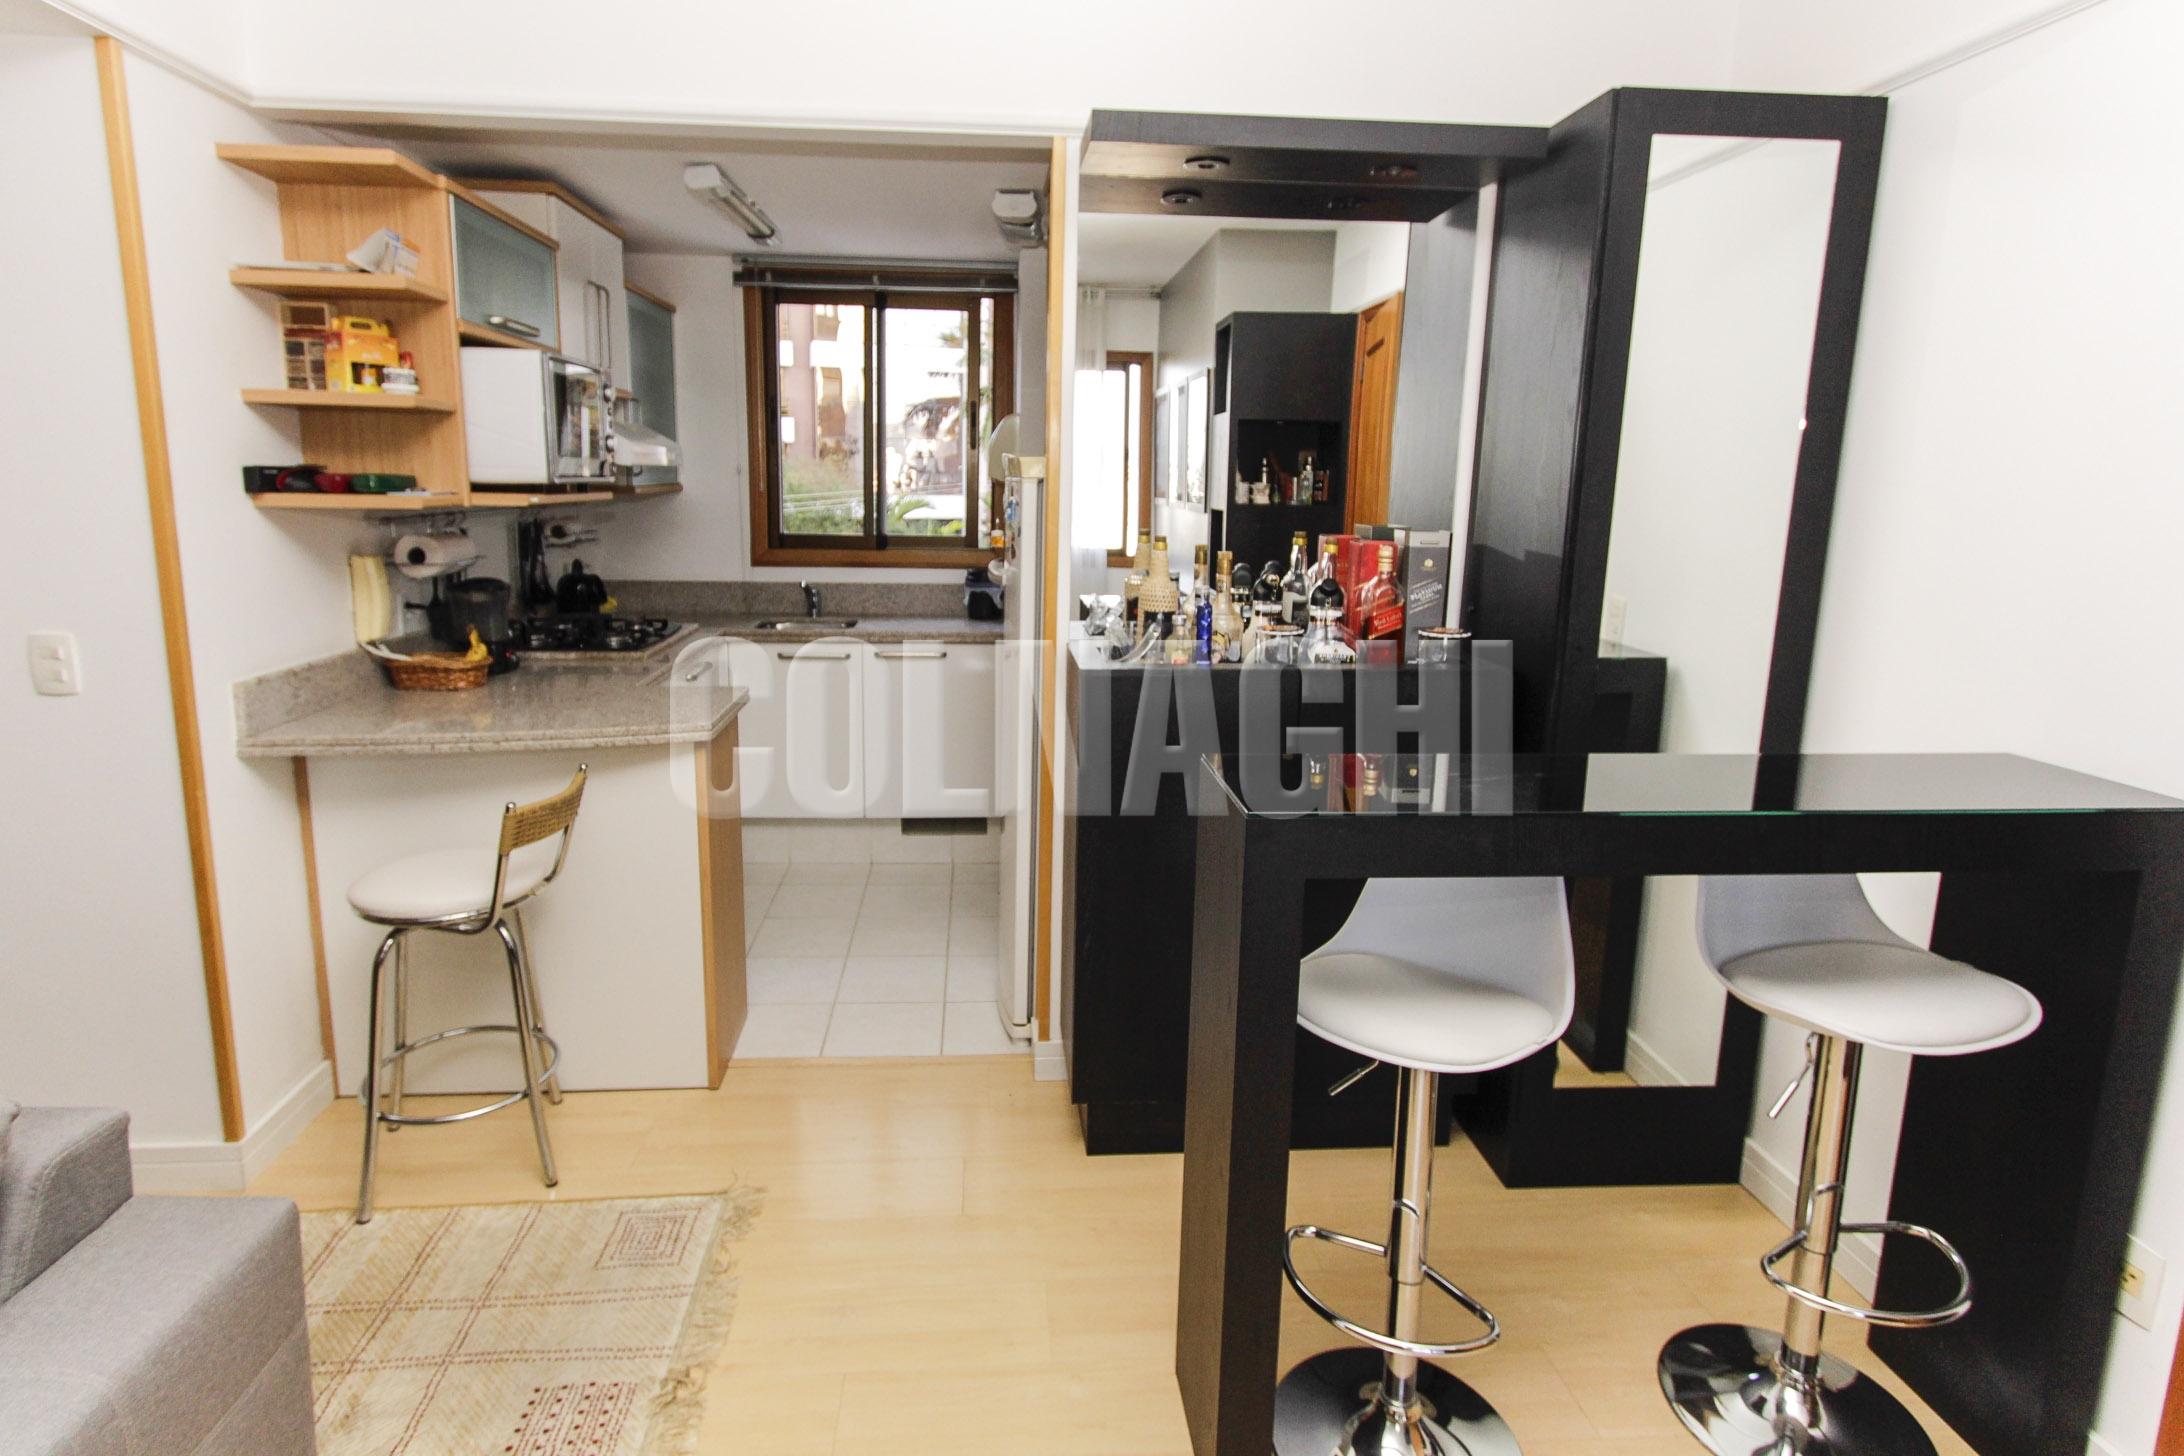 Loft Viscay - Apto 1 Dorm, Bela Vista, Porto Alegre (CL12956) - Foto 6